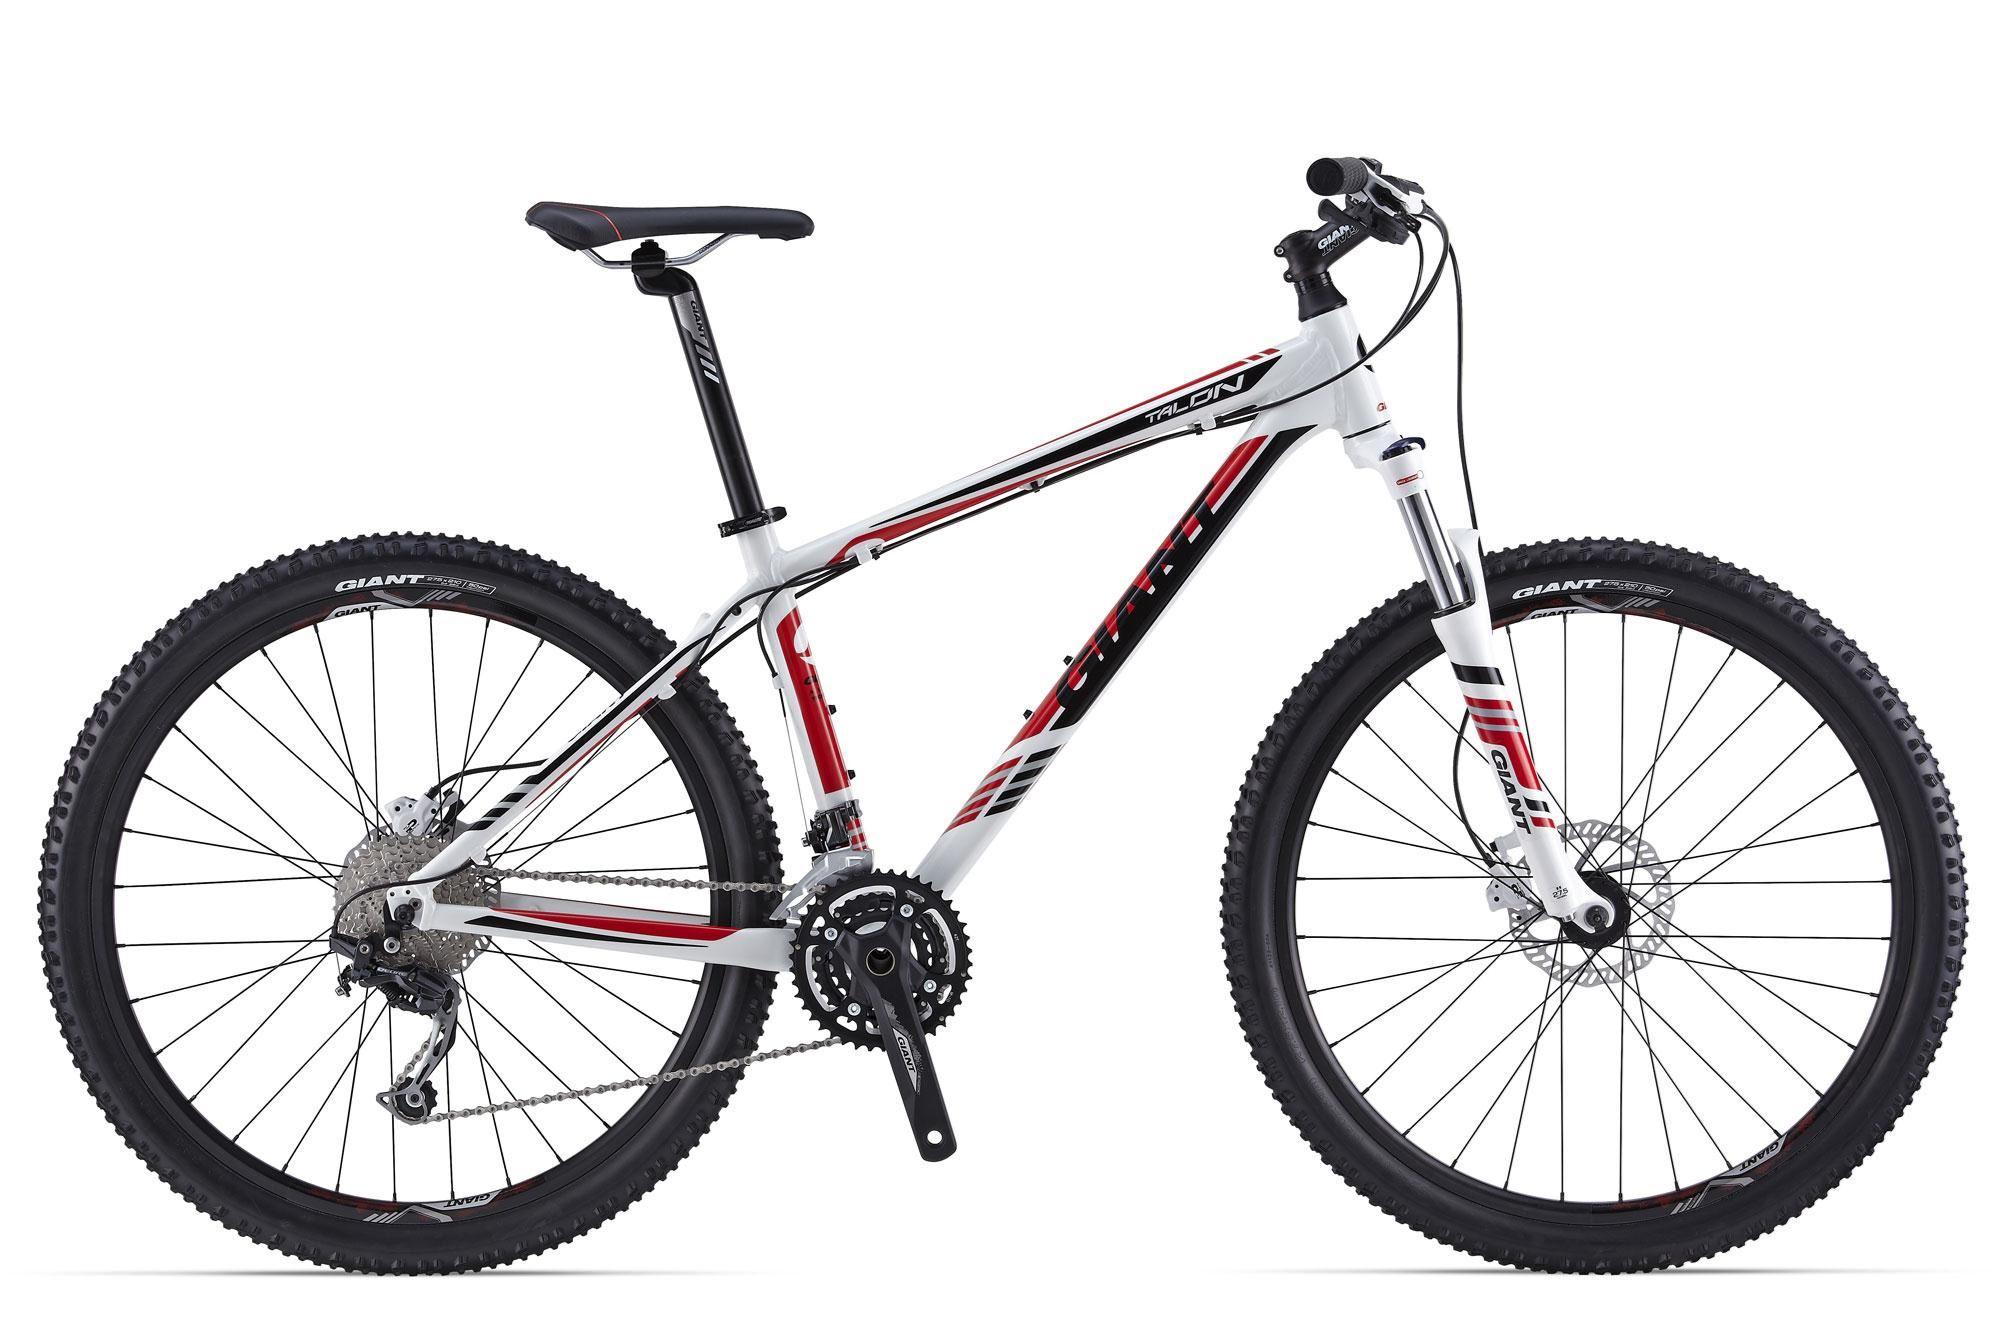 2014 Giant Talon 27.5 3 (White) (2014) - Giant Bicycles   United Kingdom